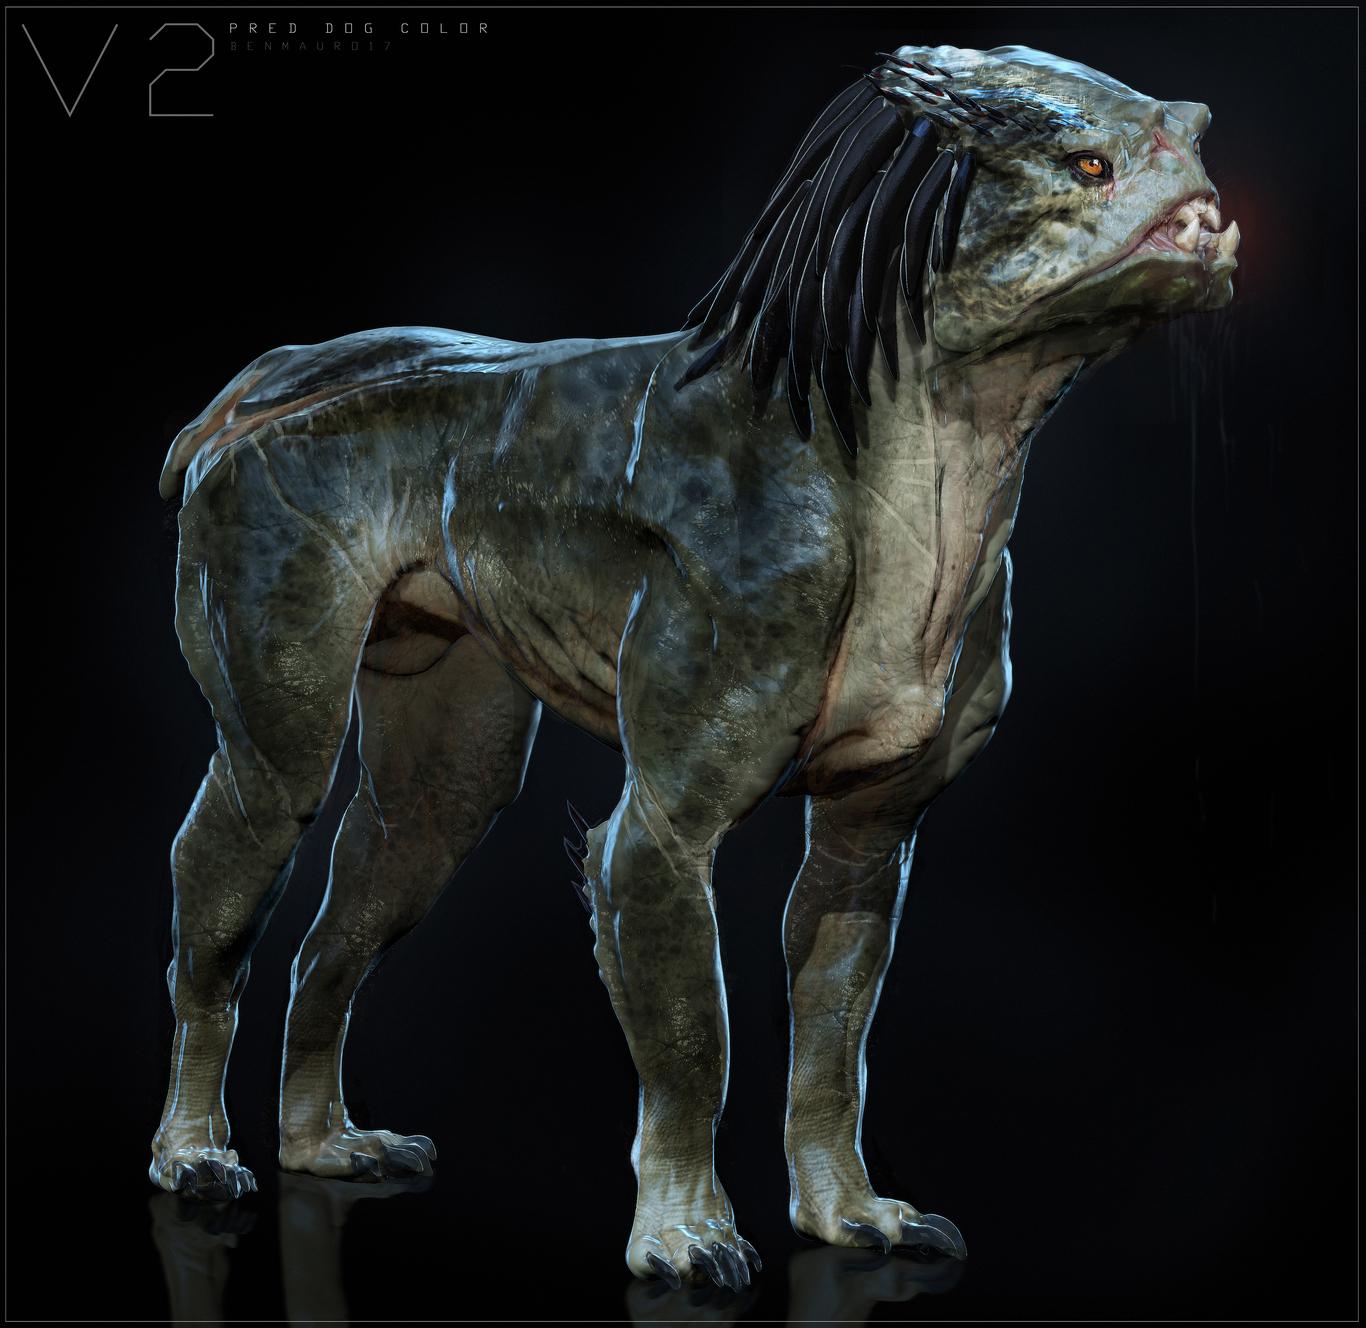 Benmauro predator dog 1 78a9461b 8icn